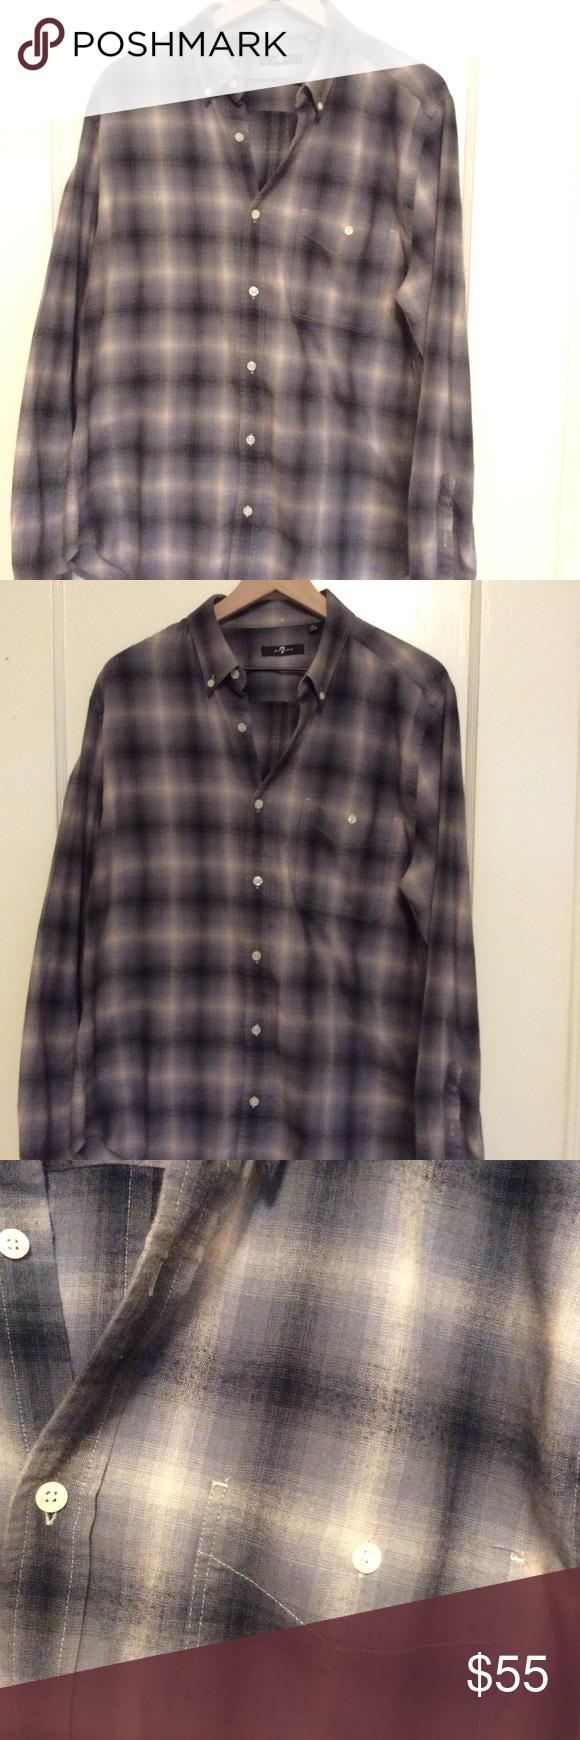 muted plaid shirt